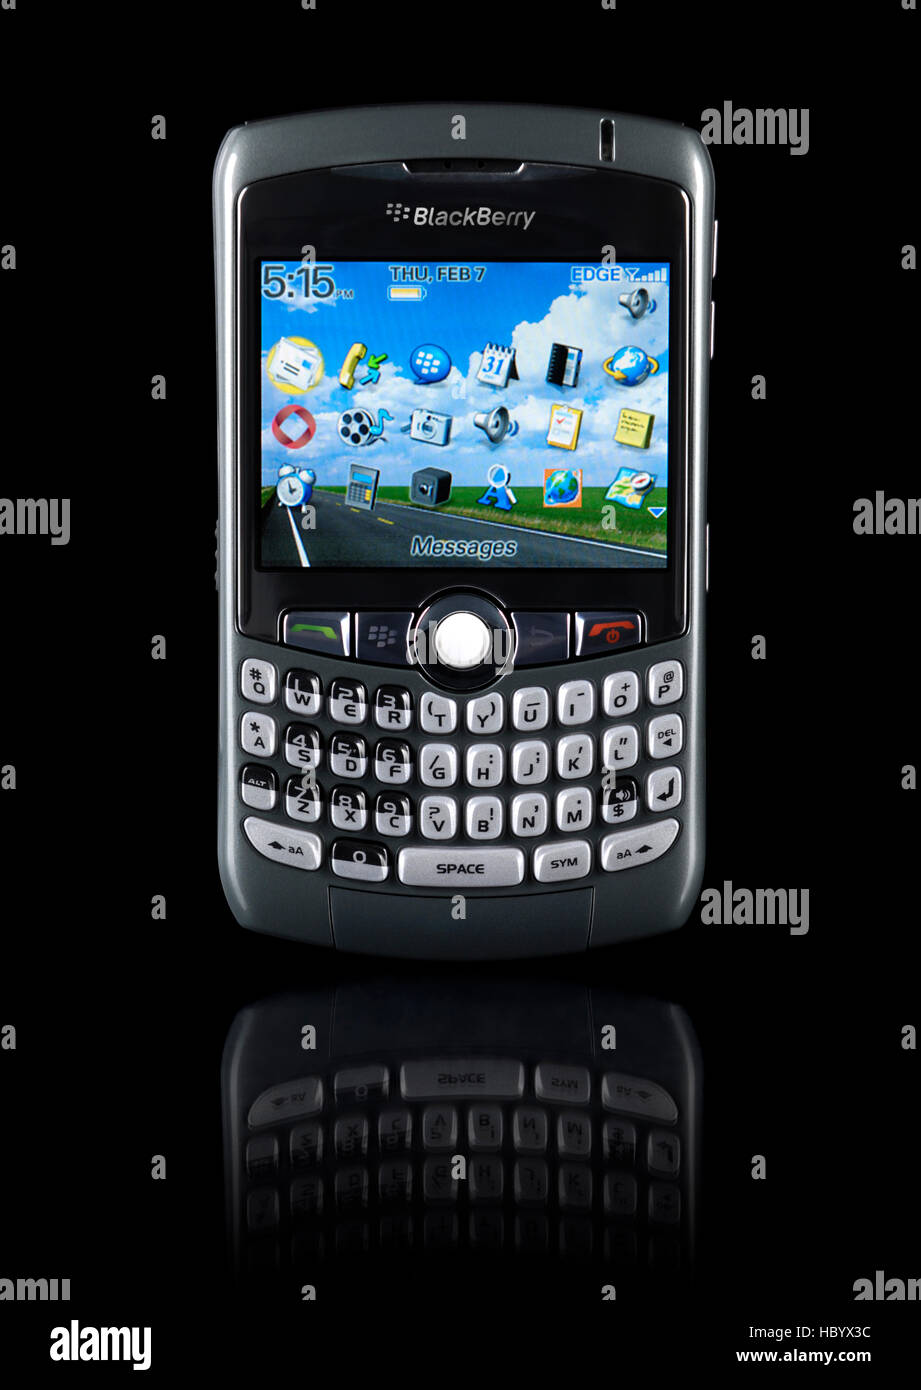 BlackBerry 8310 Curve, stylish smartphone with illuminated display - Stock  Image